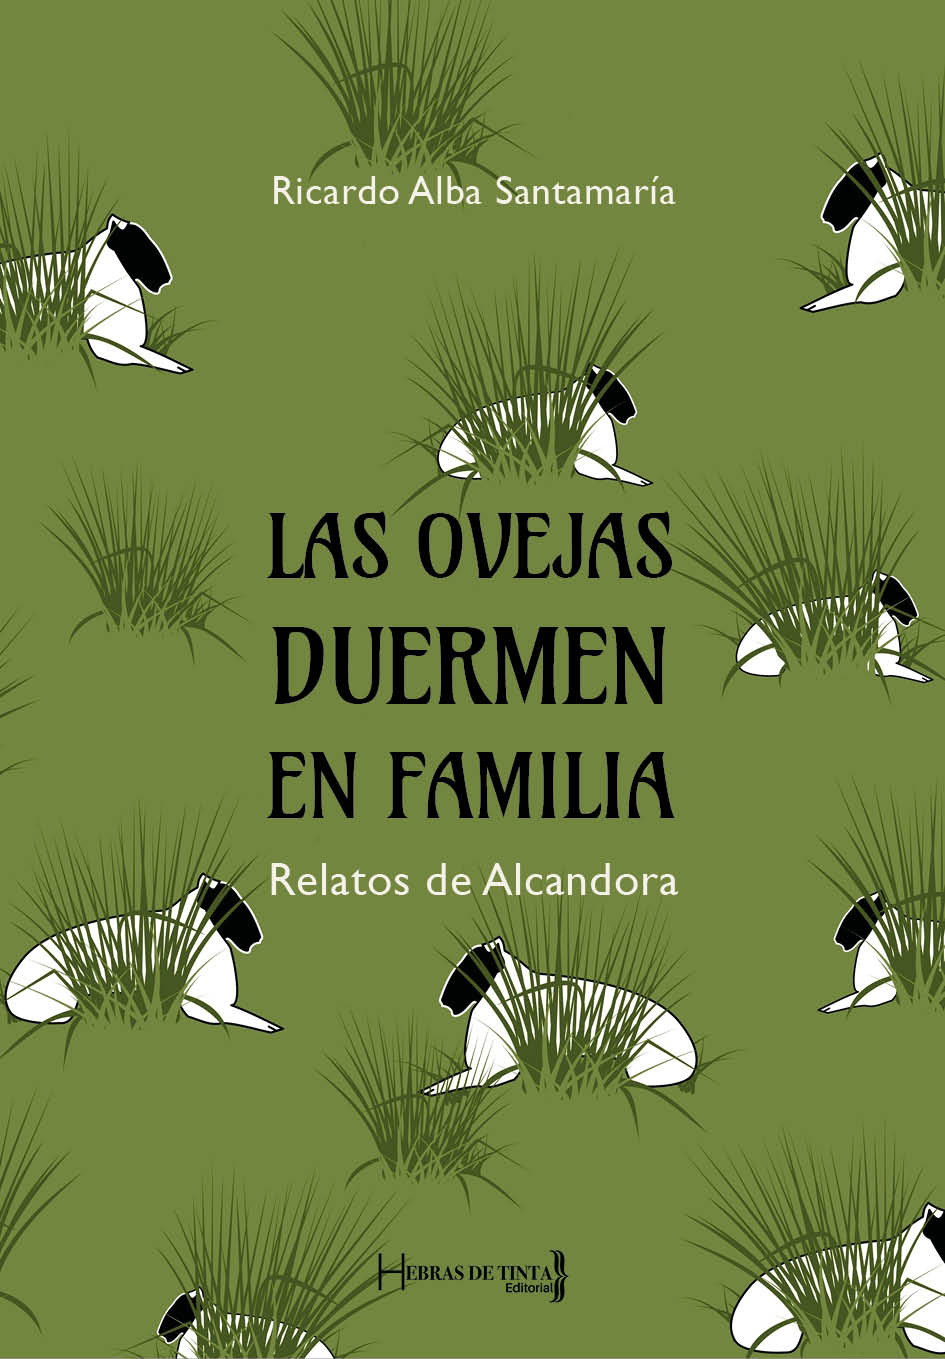 PORTADA DE LAS OVEJAS DUERMEN EN FAMILIA